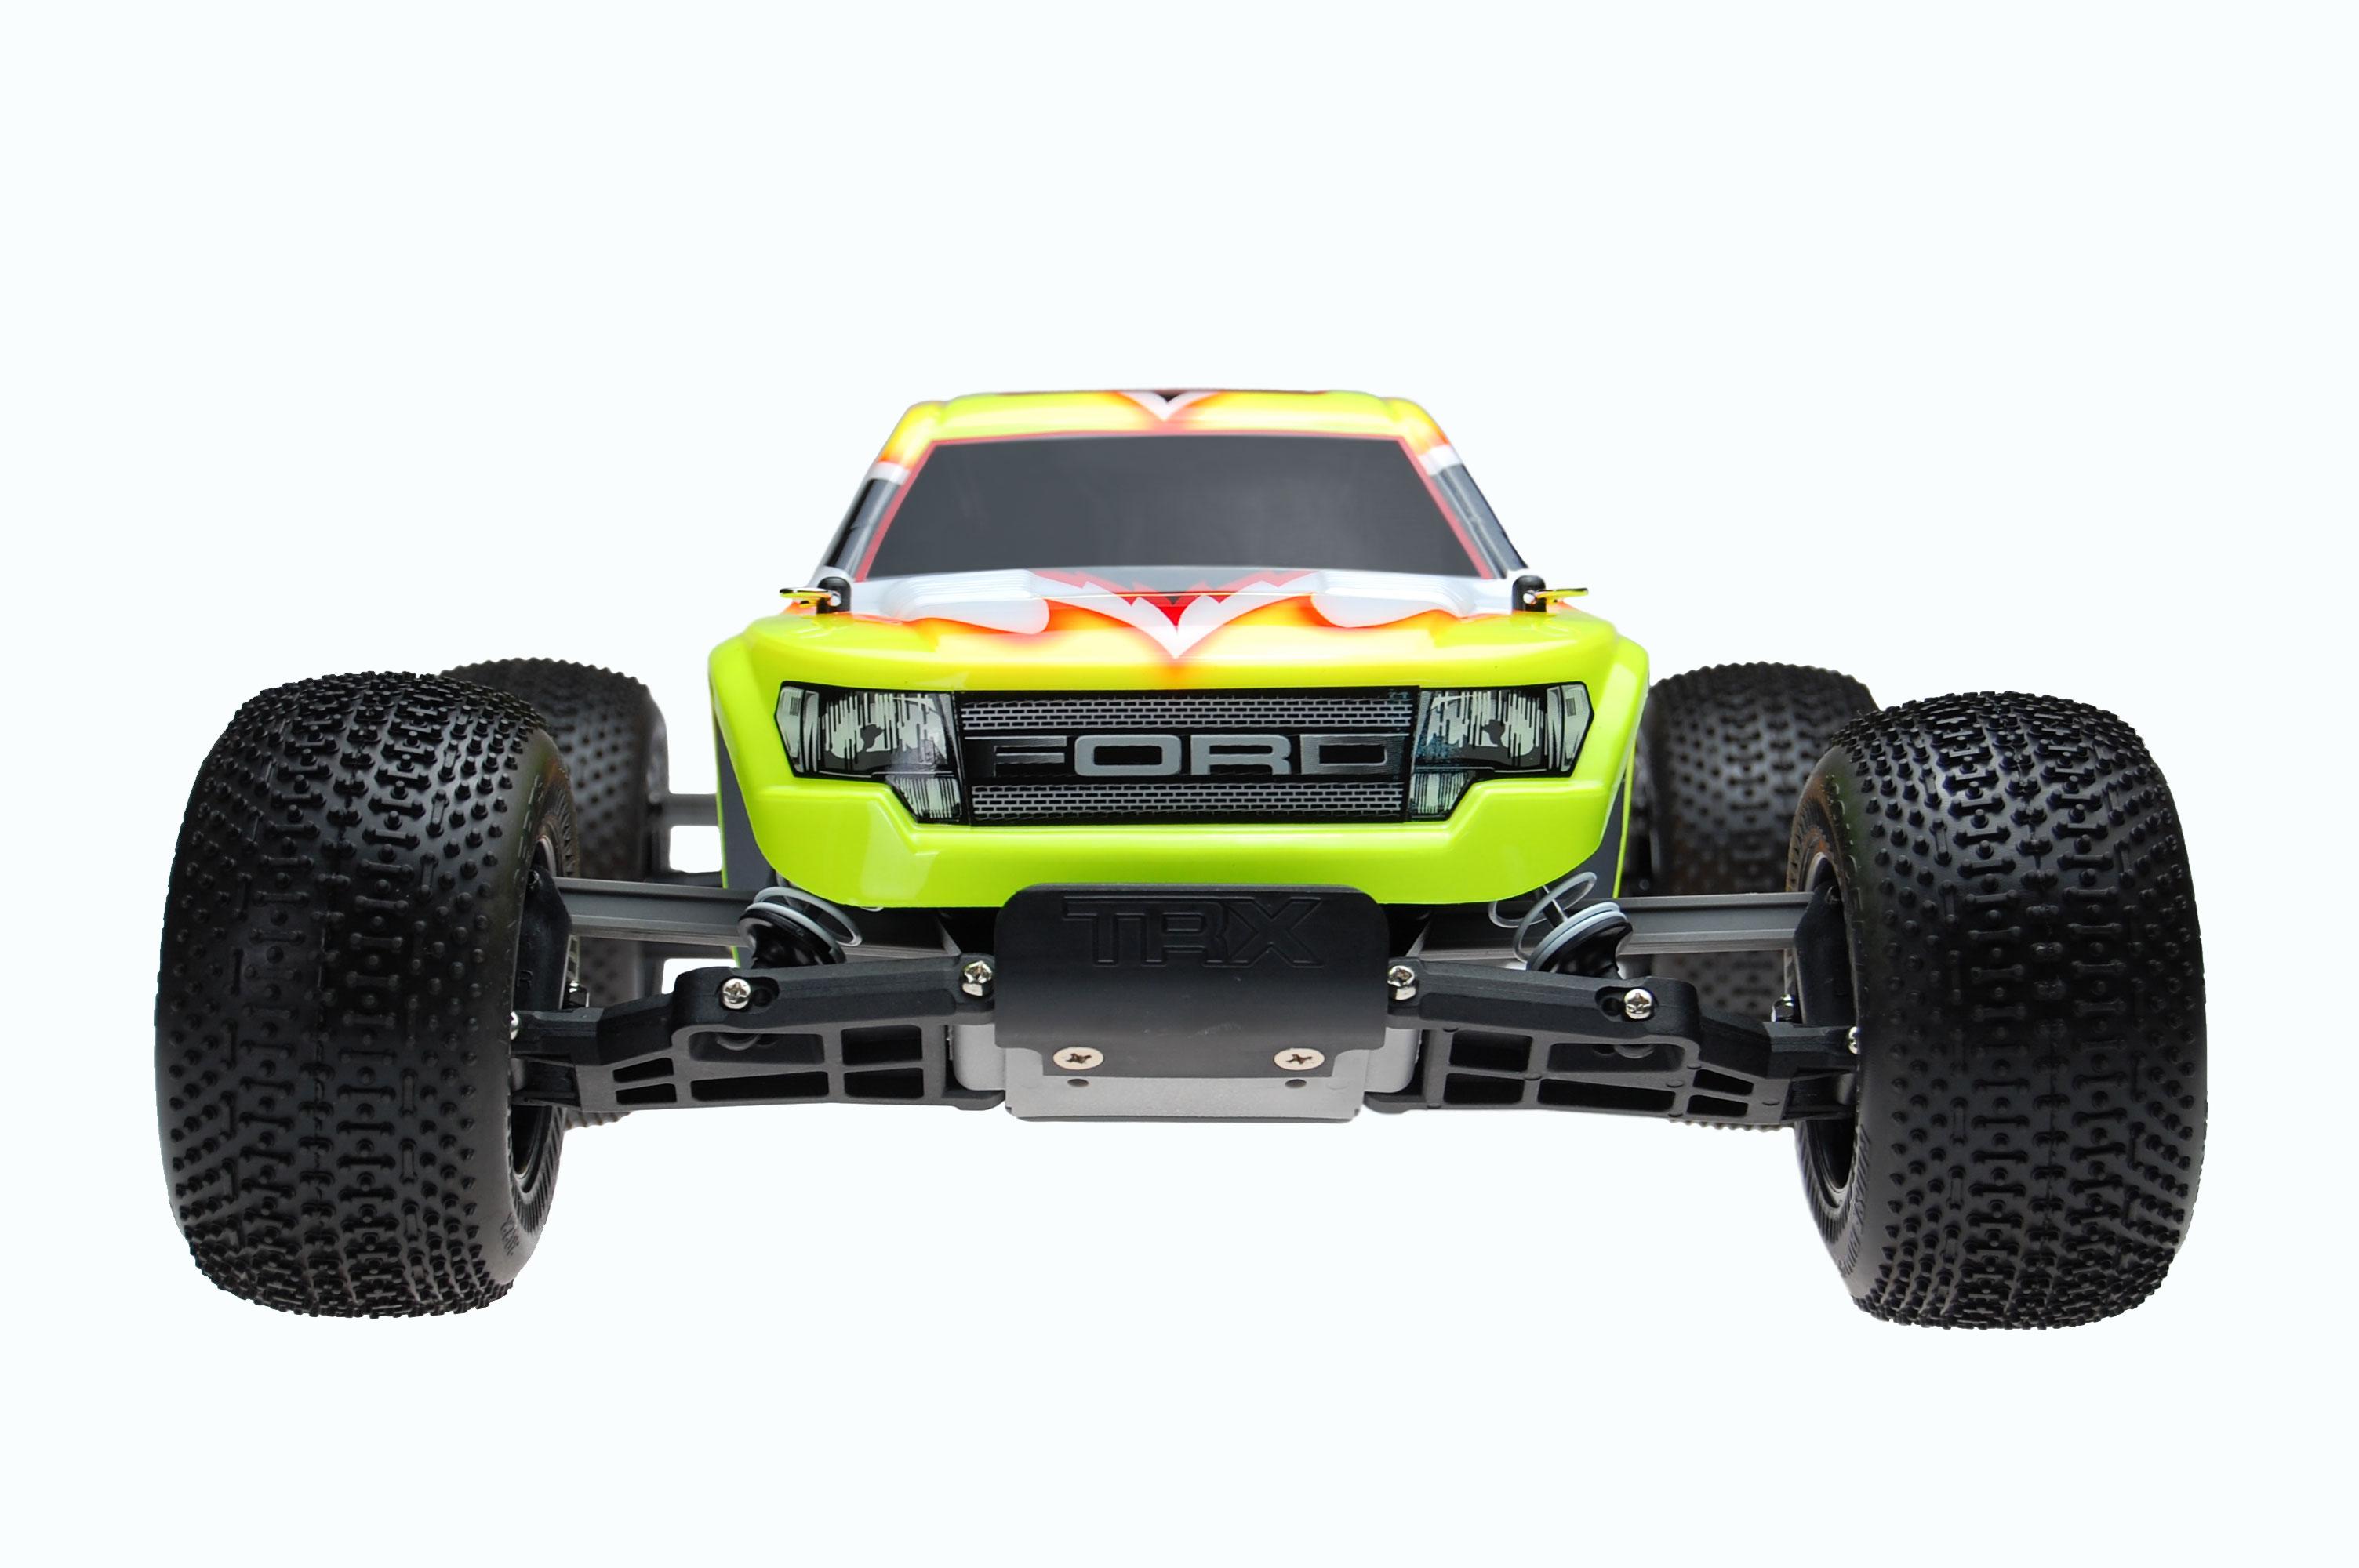 Illuzion – Rustler XL 5 Ford Raptor SVT body